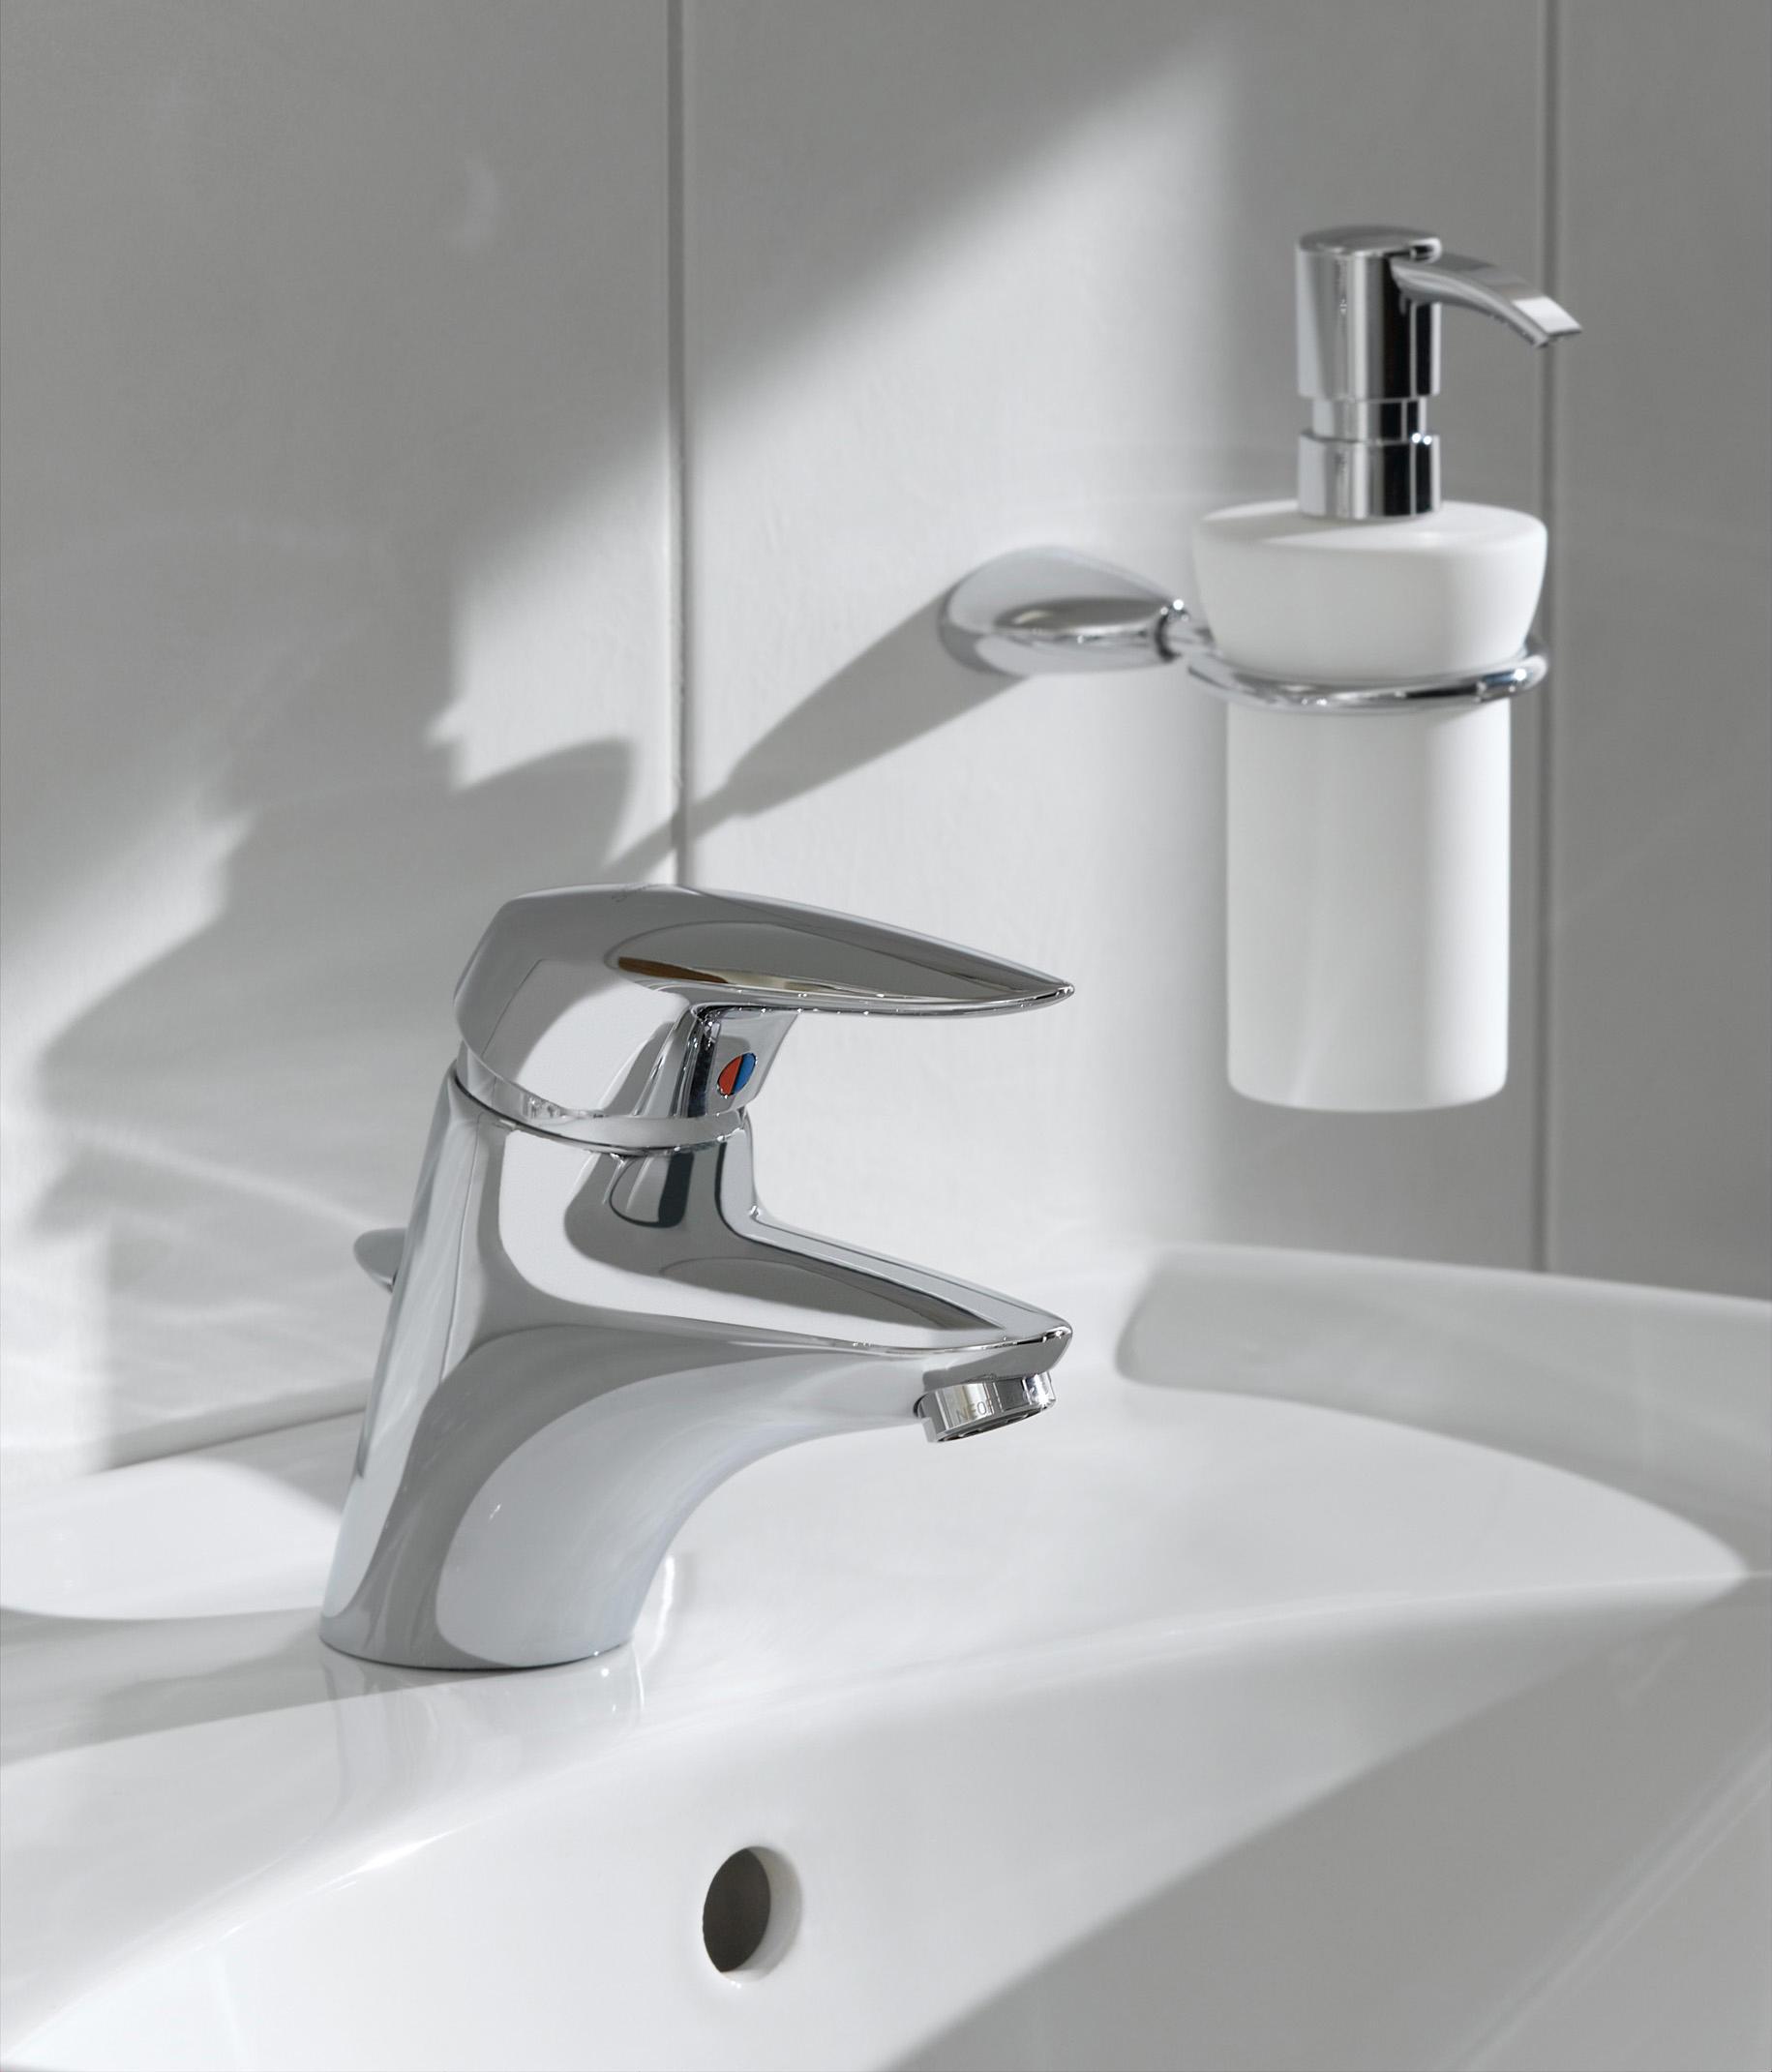 ceramix blue brausearmatur ap aufputz rubinetteria. Black Bedroom Furniture Sets. Home Design Ideas